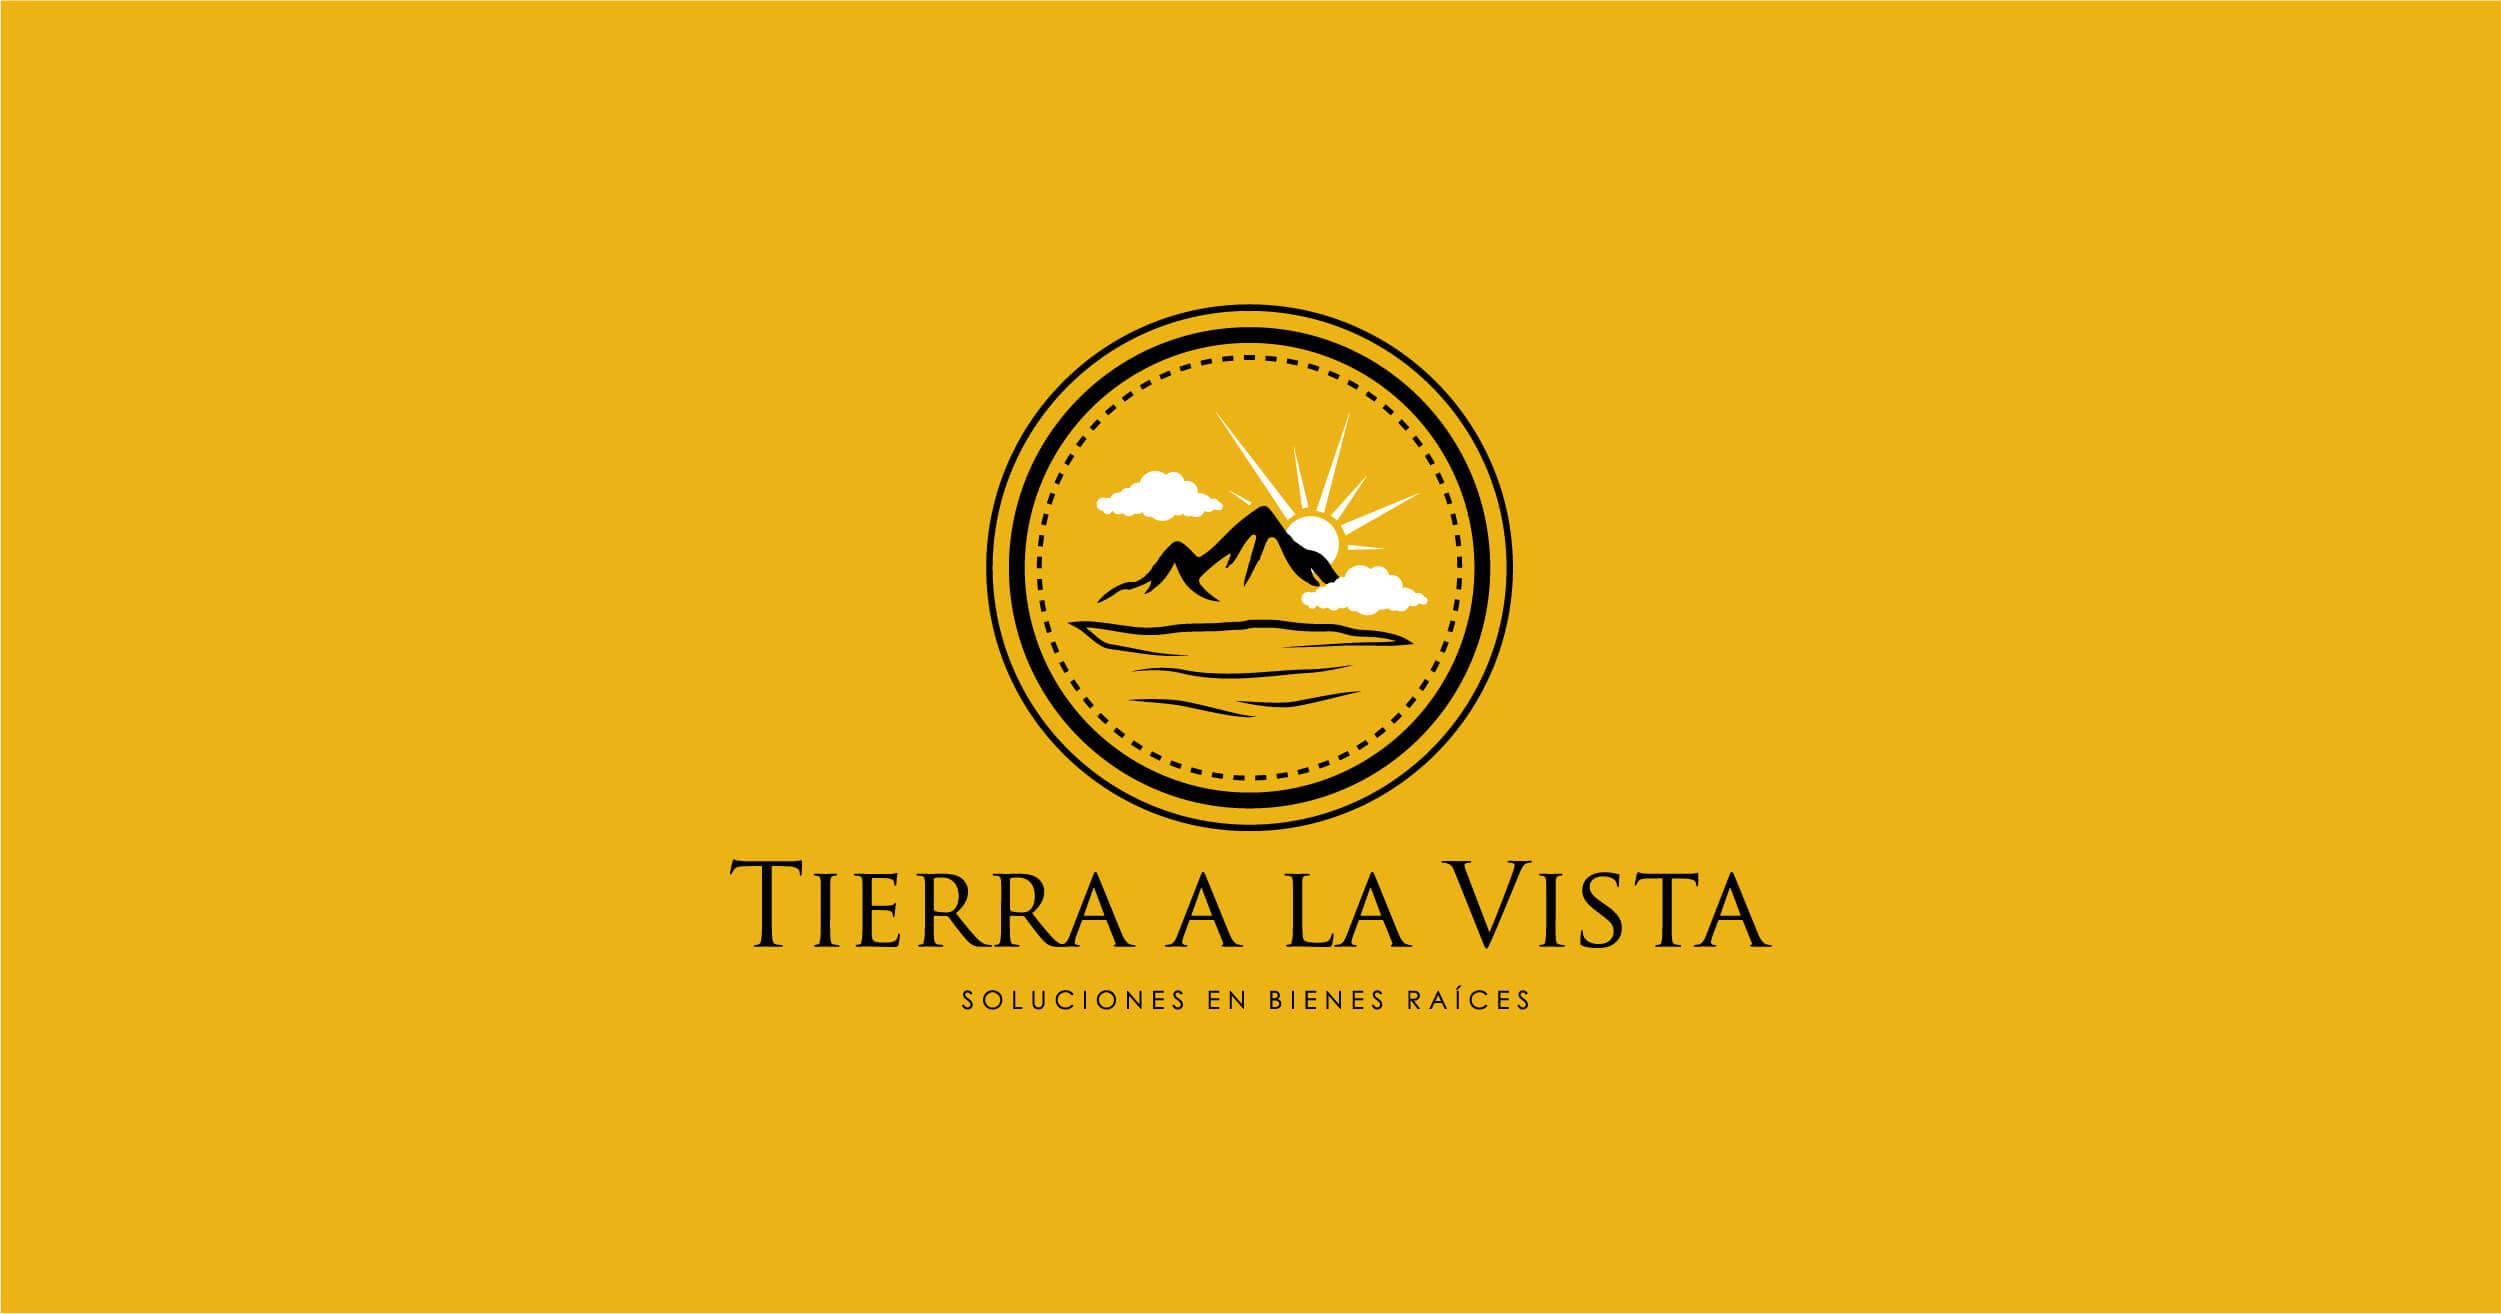 FullFrame-Photomkt-Portafolio-Cover-Tierra-A-La-Vista(1)